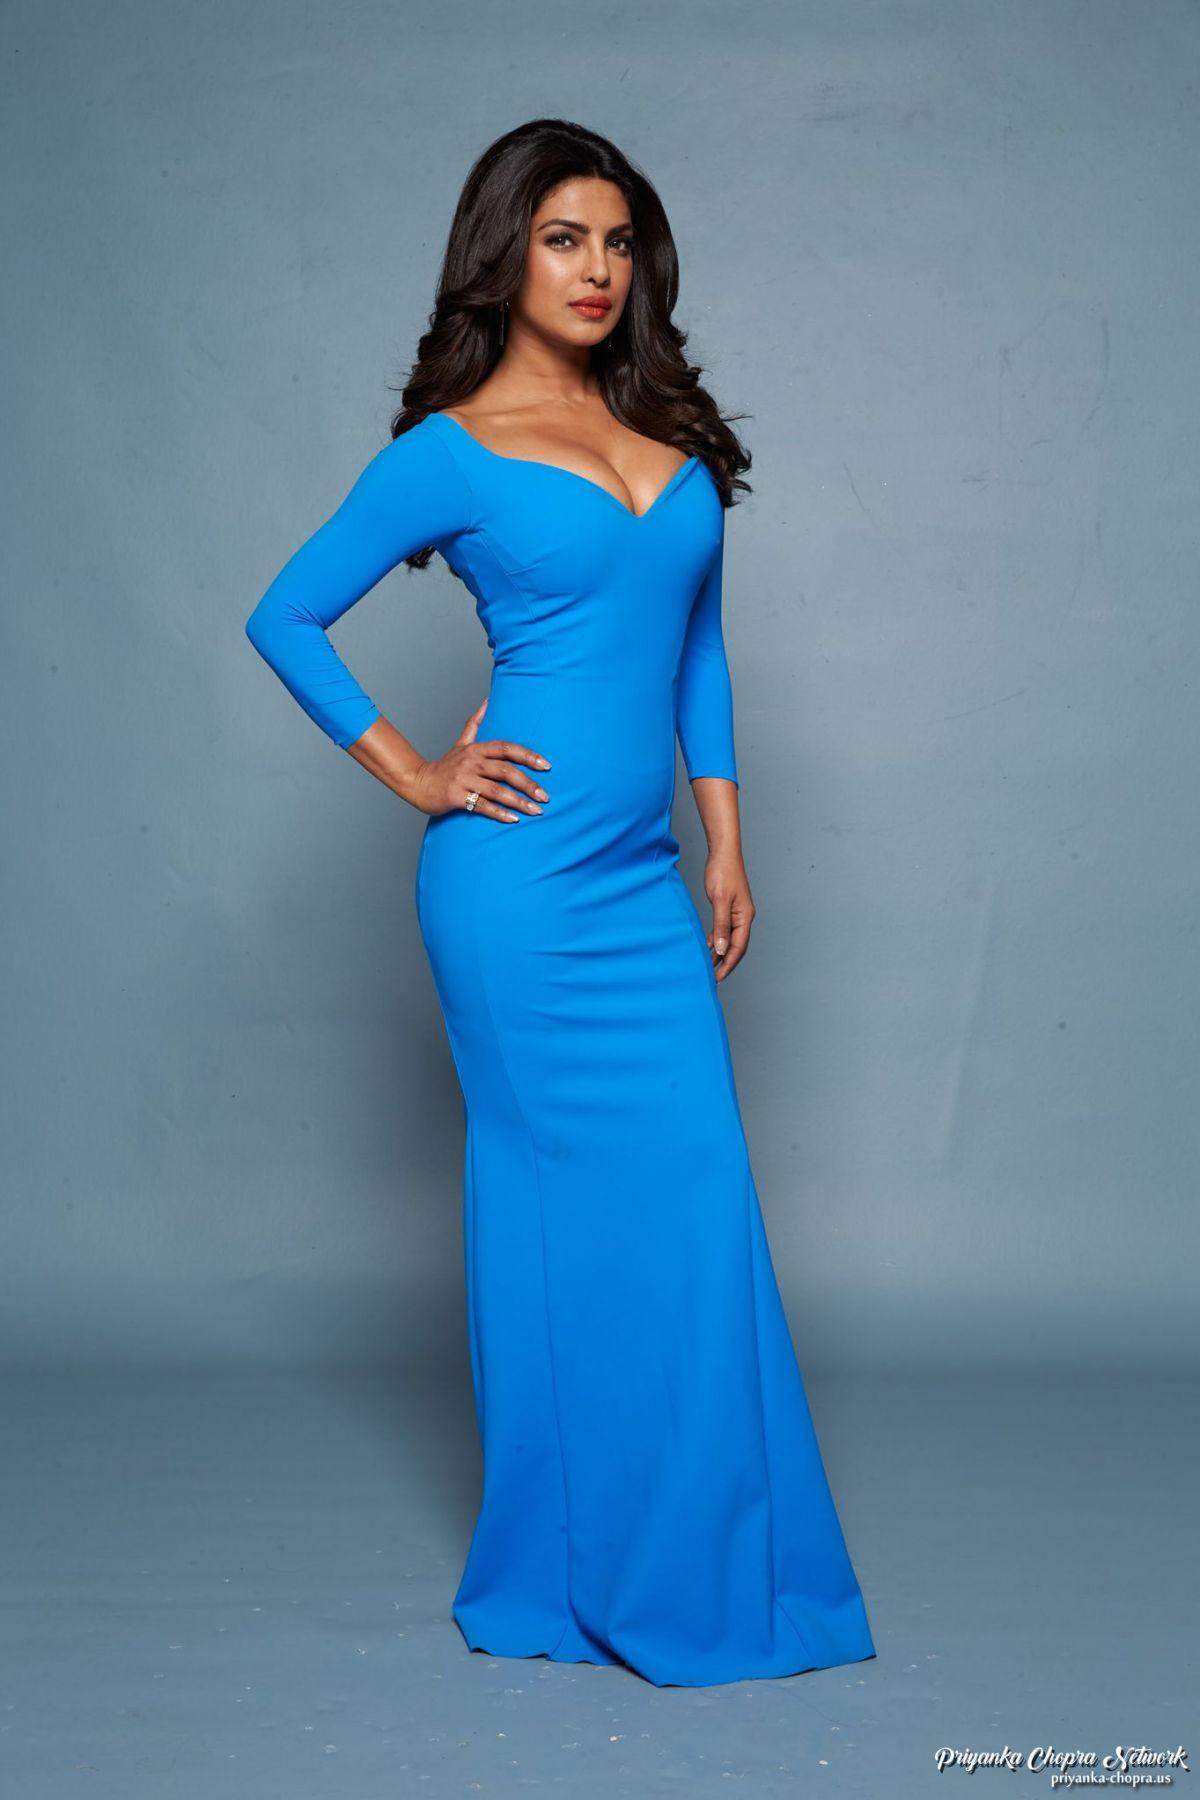 Priyanka Chopra Baywatch Promos Set 5 15 Hawtcelebs